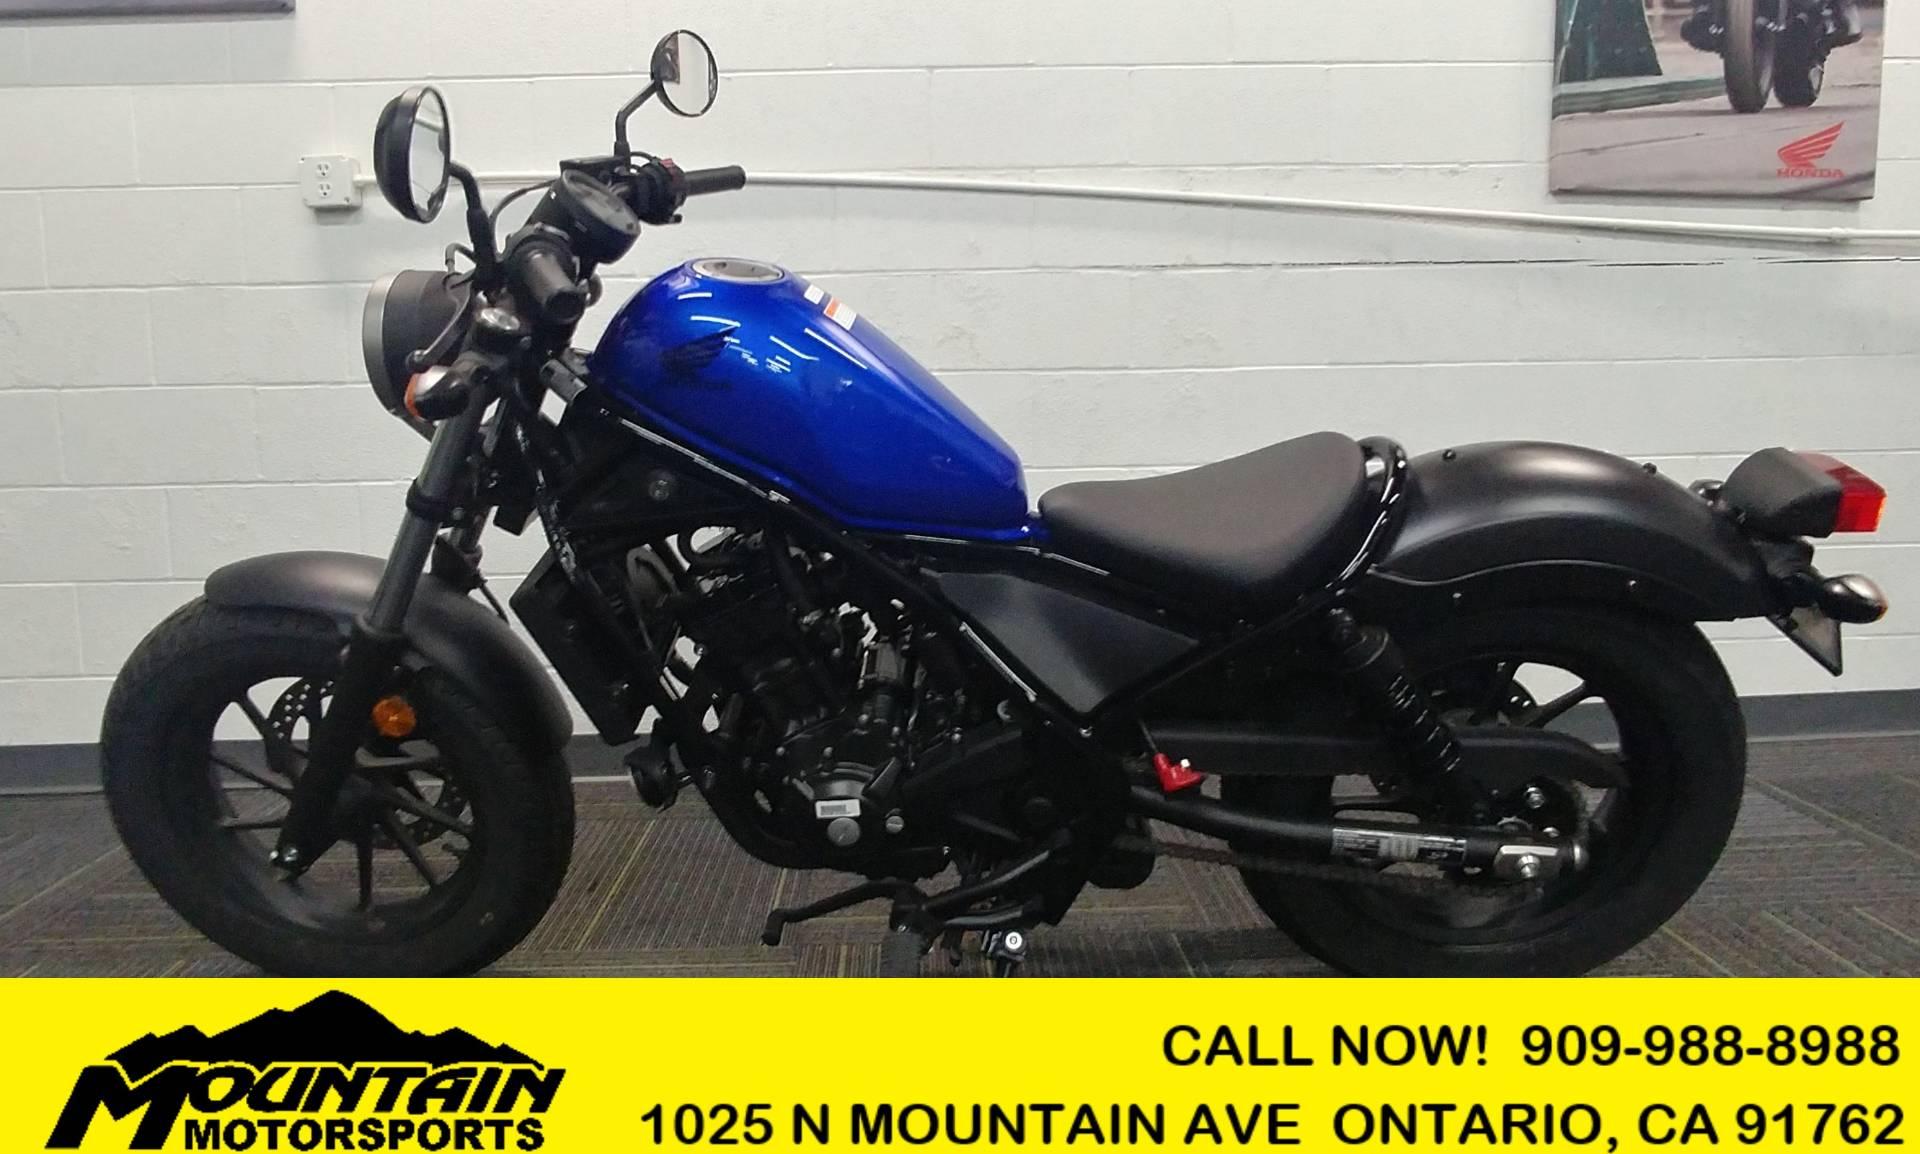 2018 Honda Rebel 300 for sale 41599